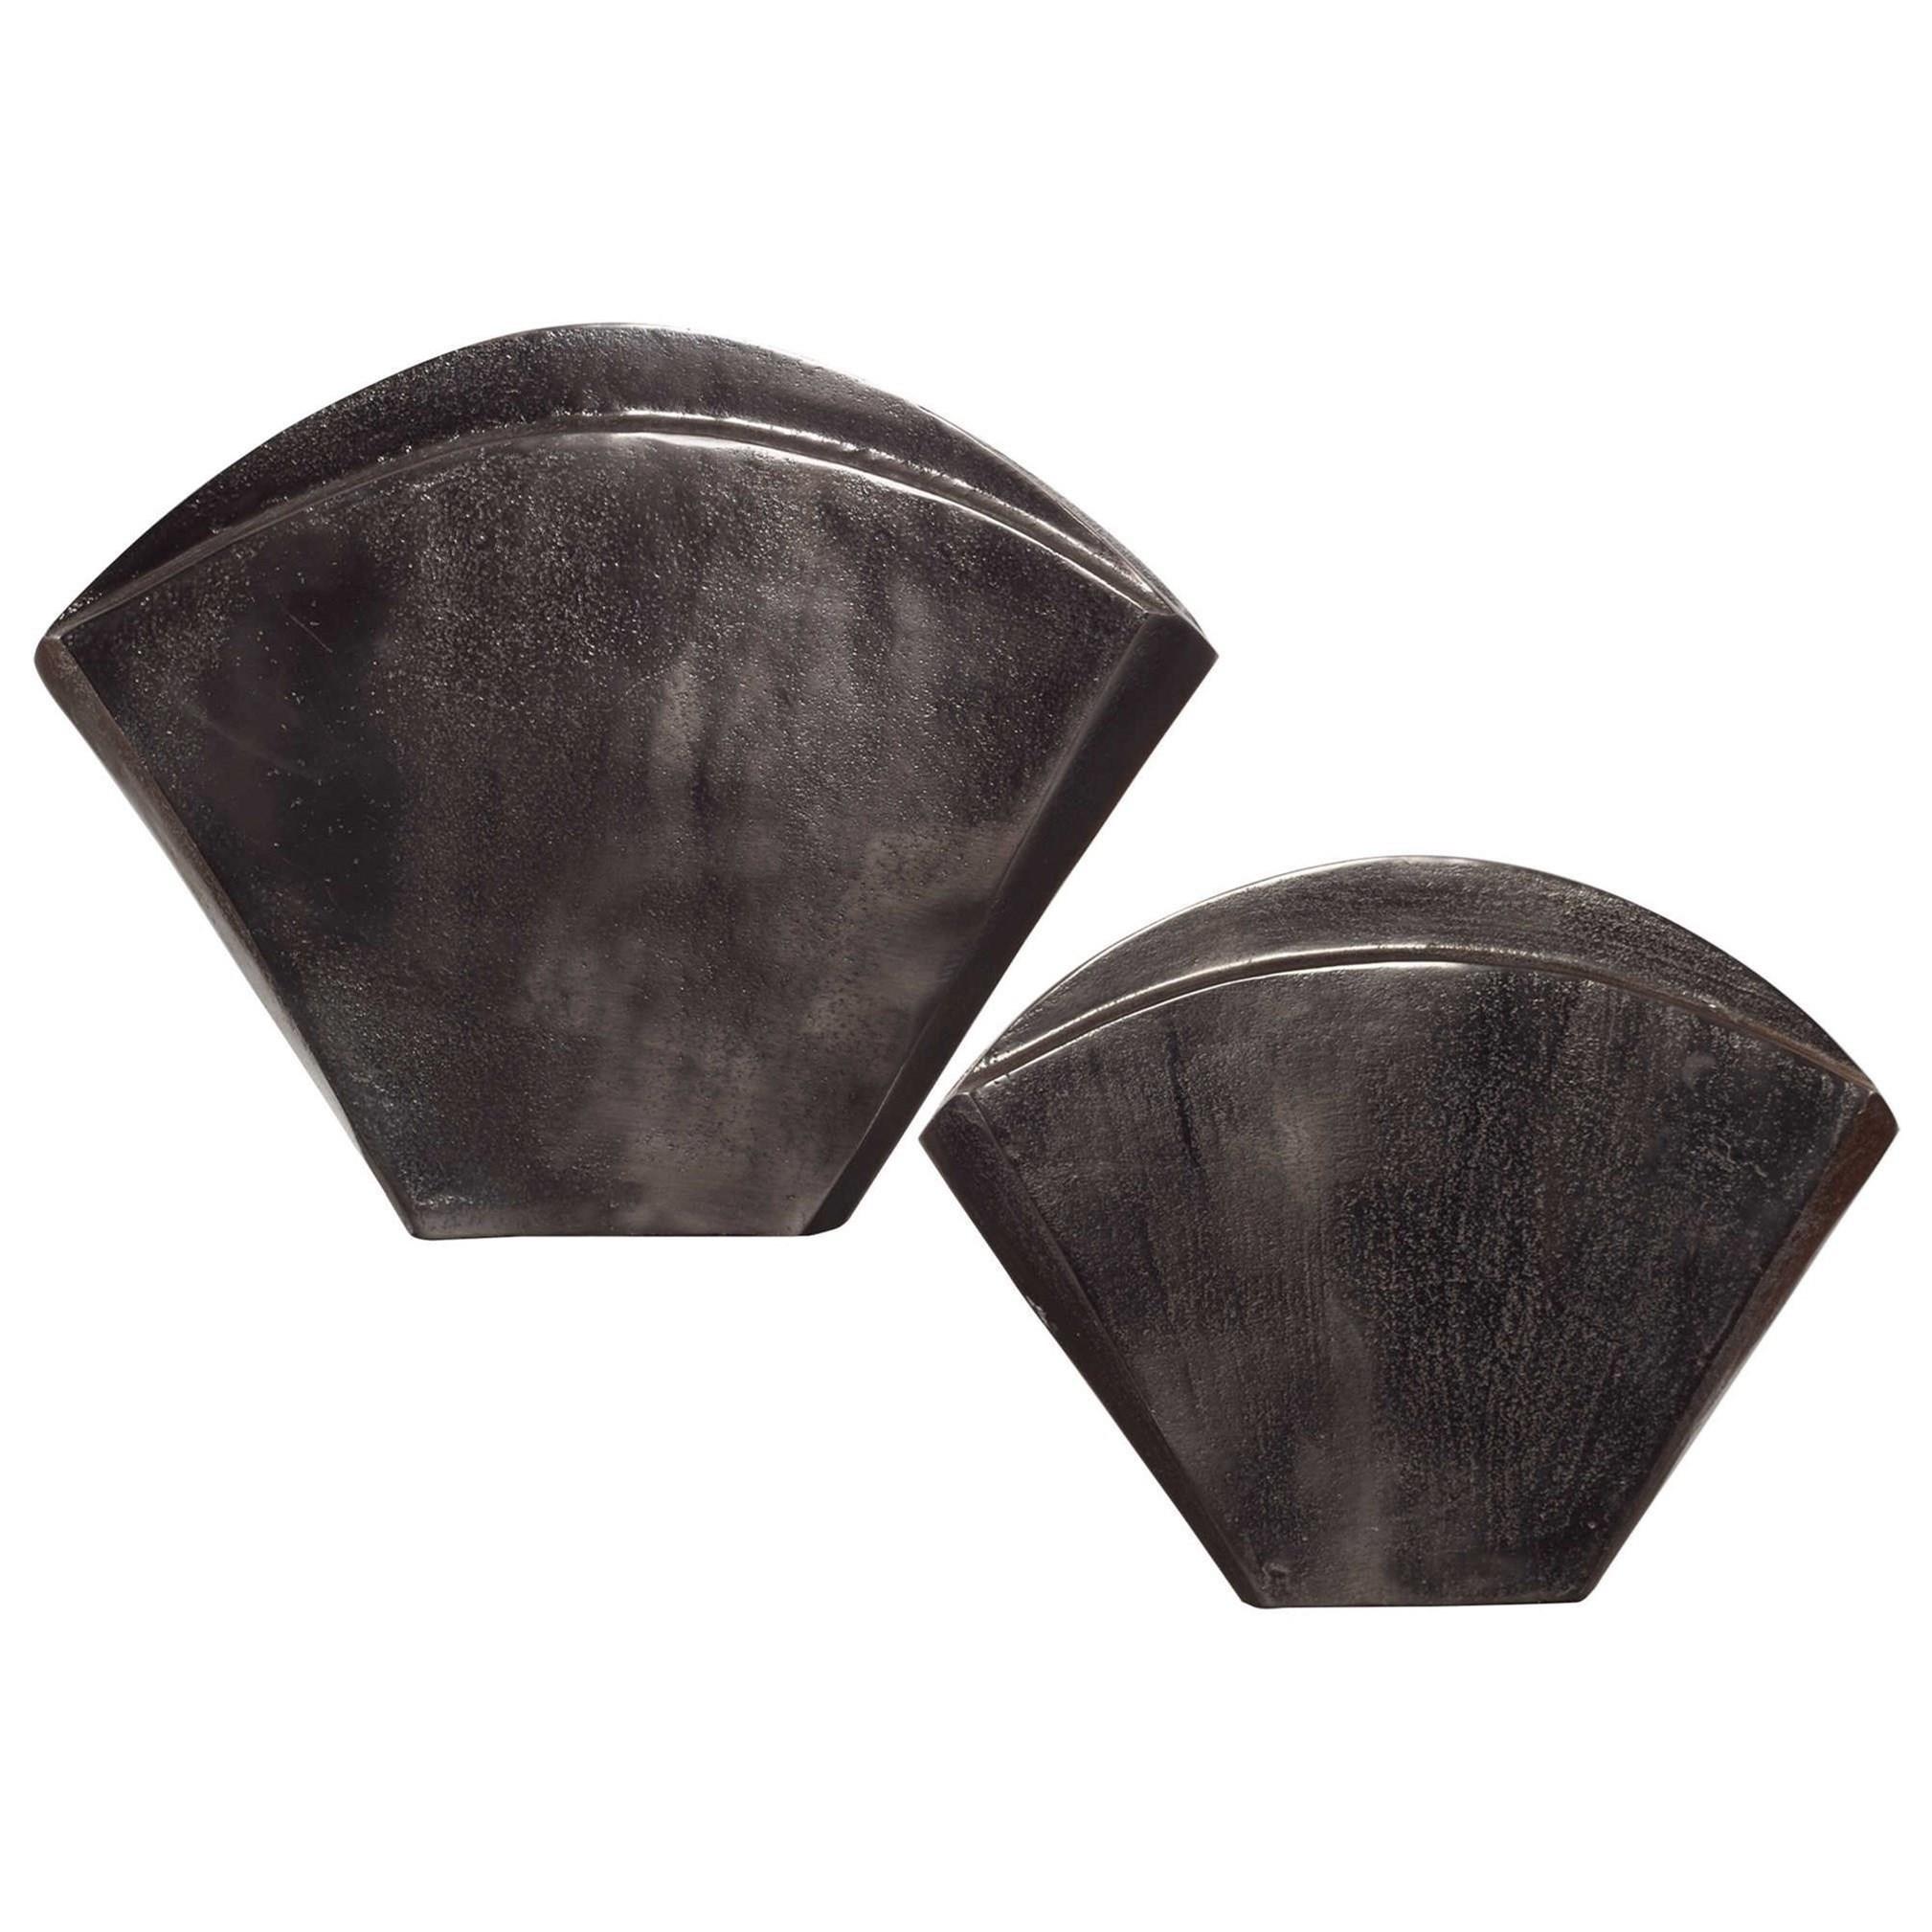 Accessories - Vases and Urns Filip Dark Nickel Vases Set/2 by Uttermost at Mueller Furniture